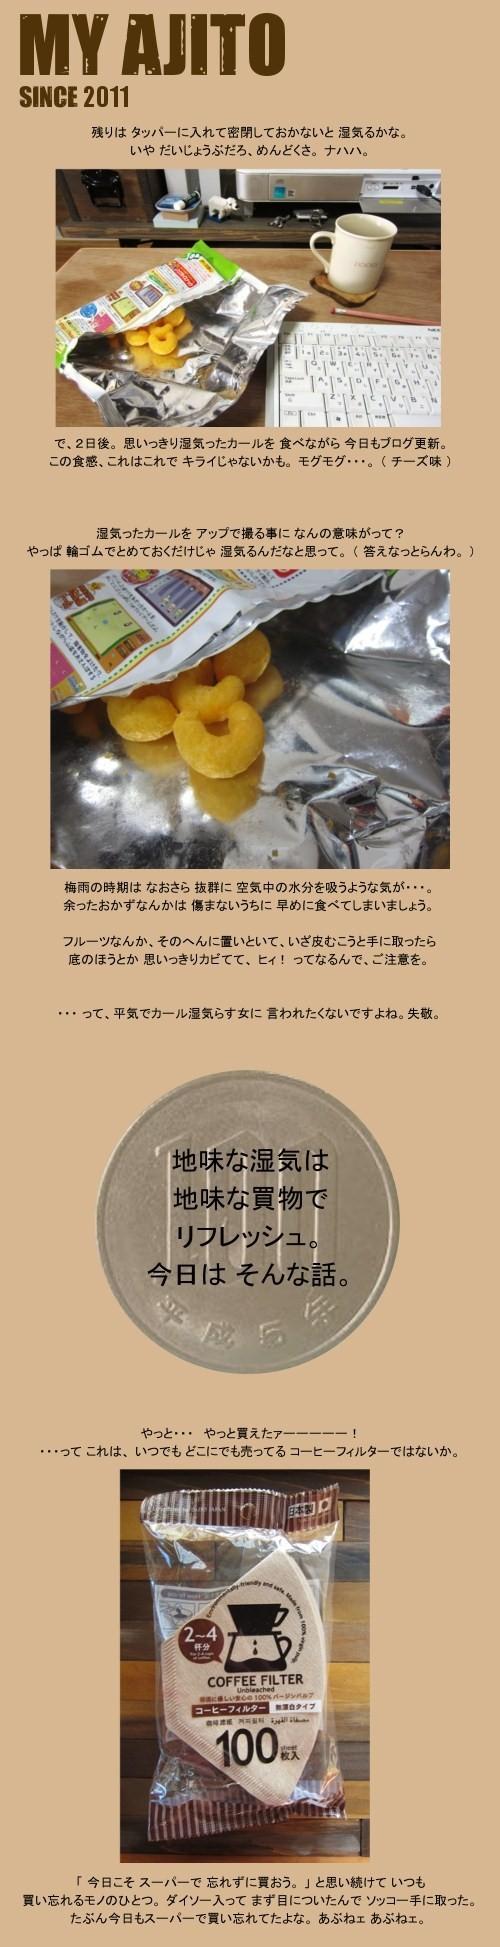 TSUYU_1.jpg